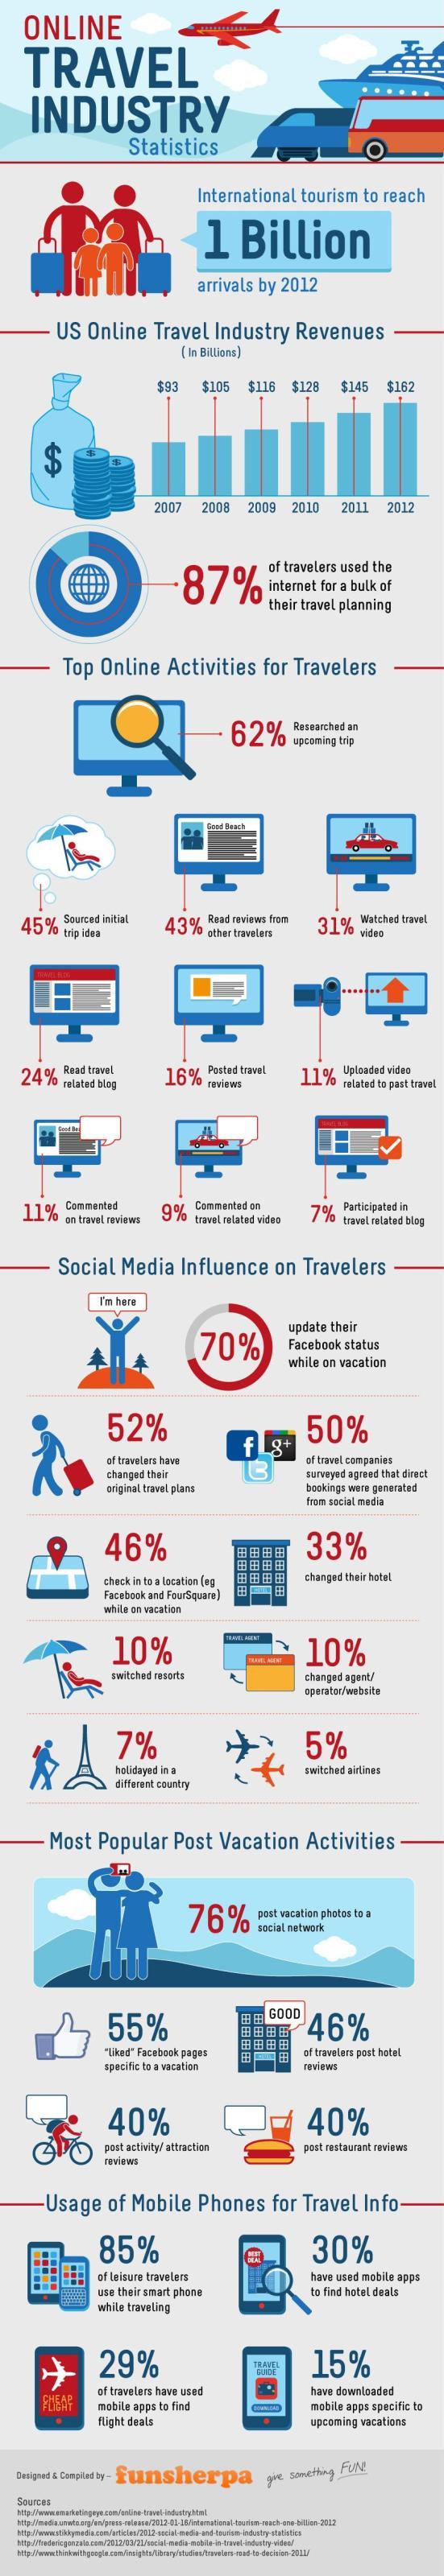 Social Media and Travel